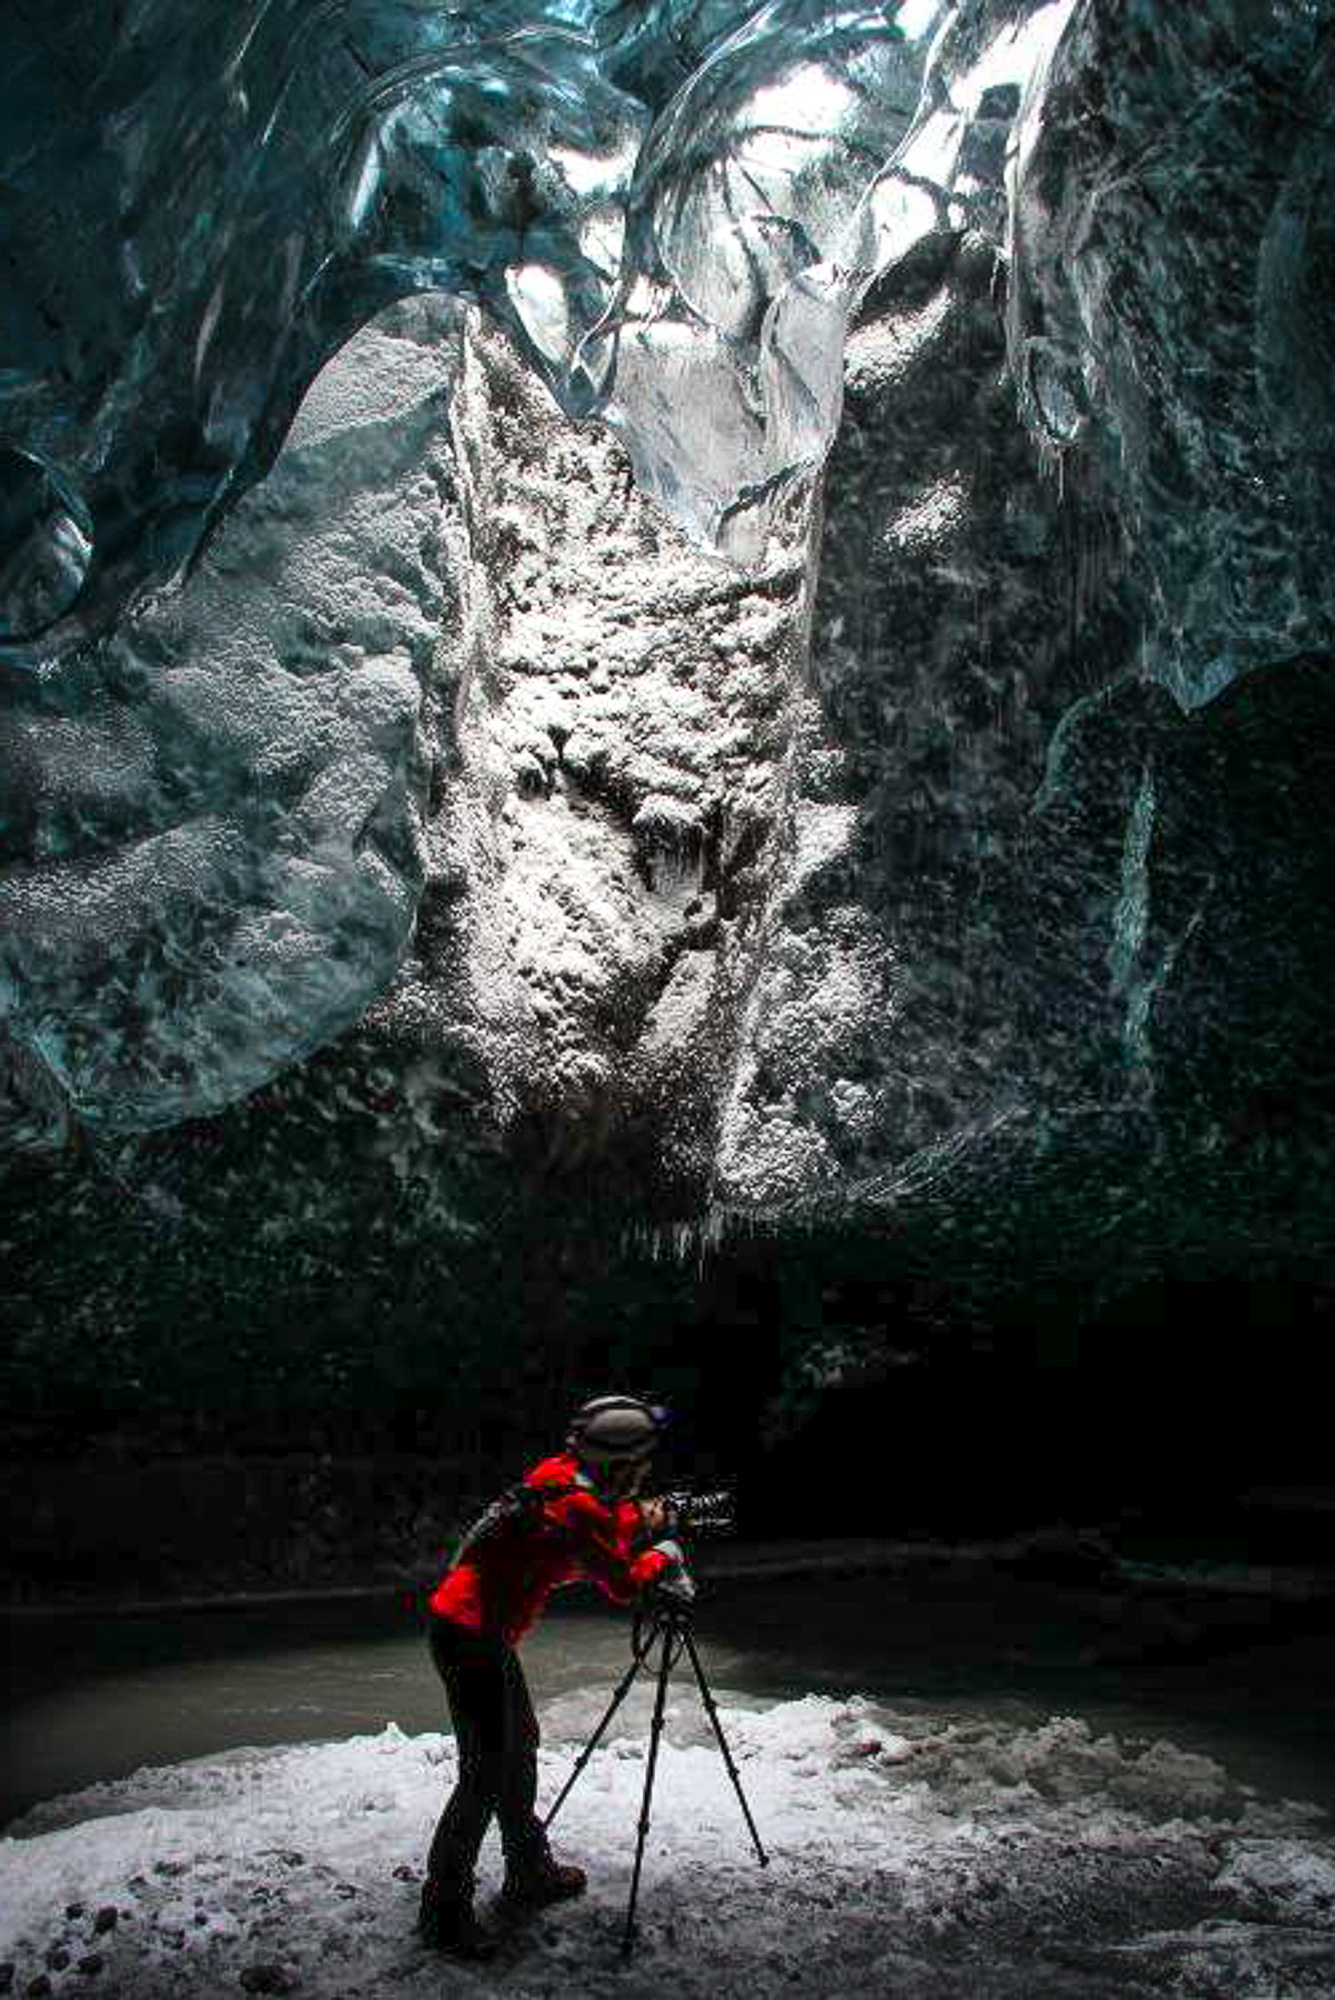 IceCavesJONAA©Agust Runarsson-13.jpg